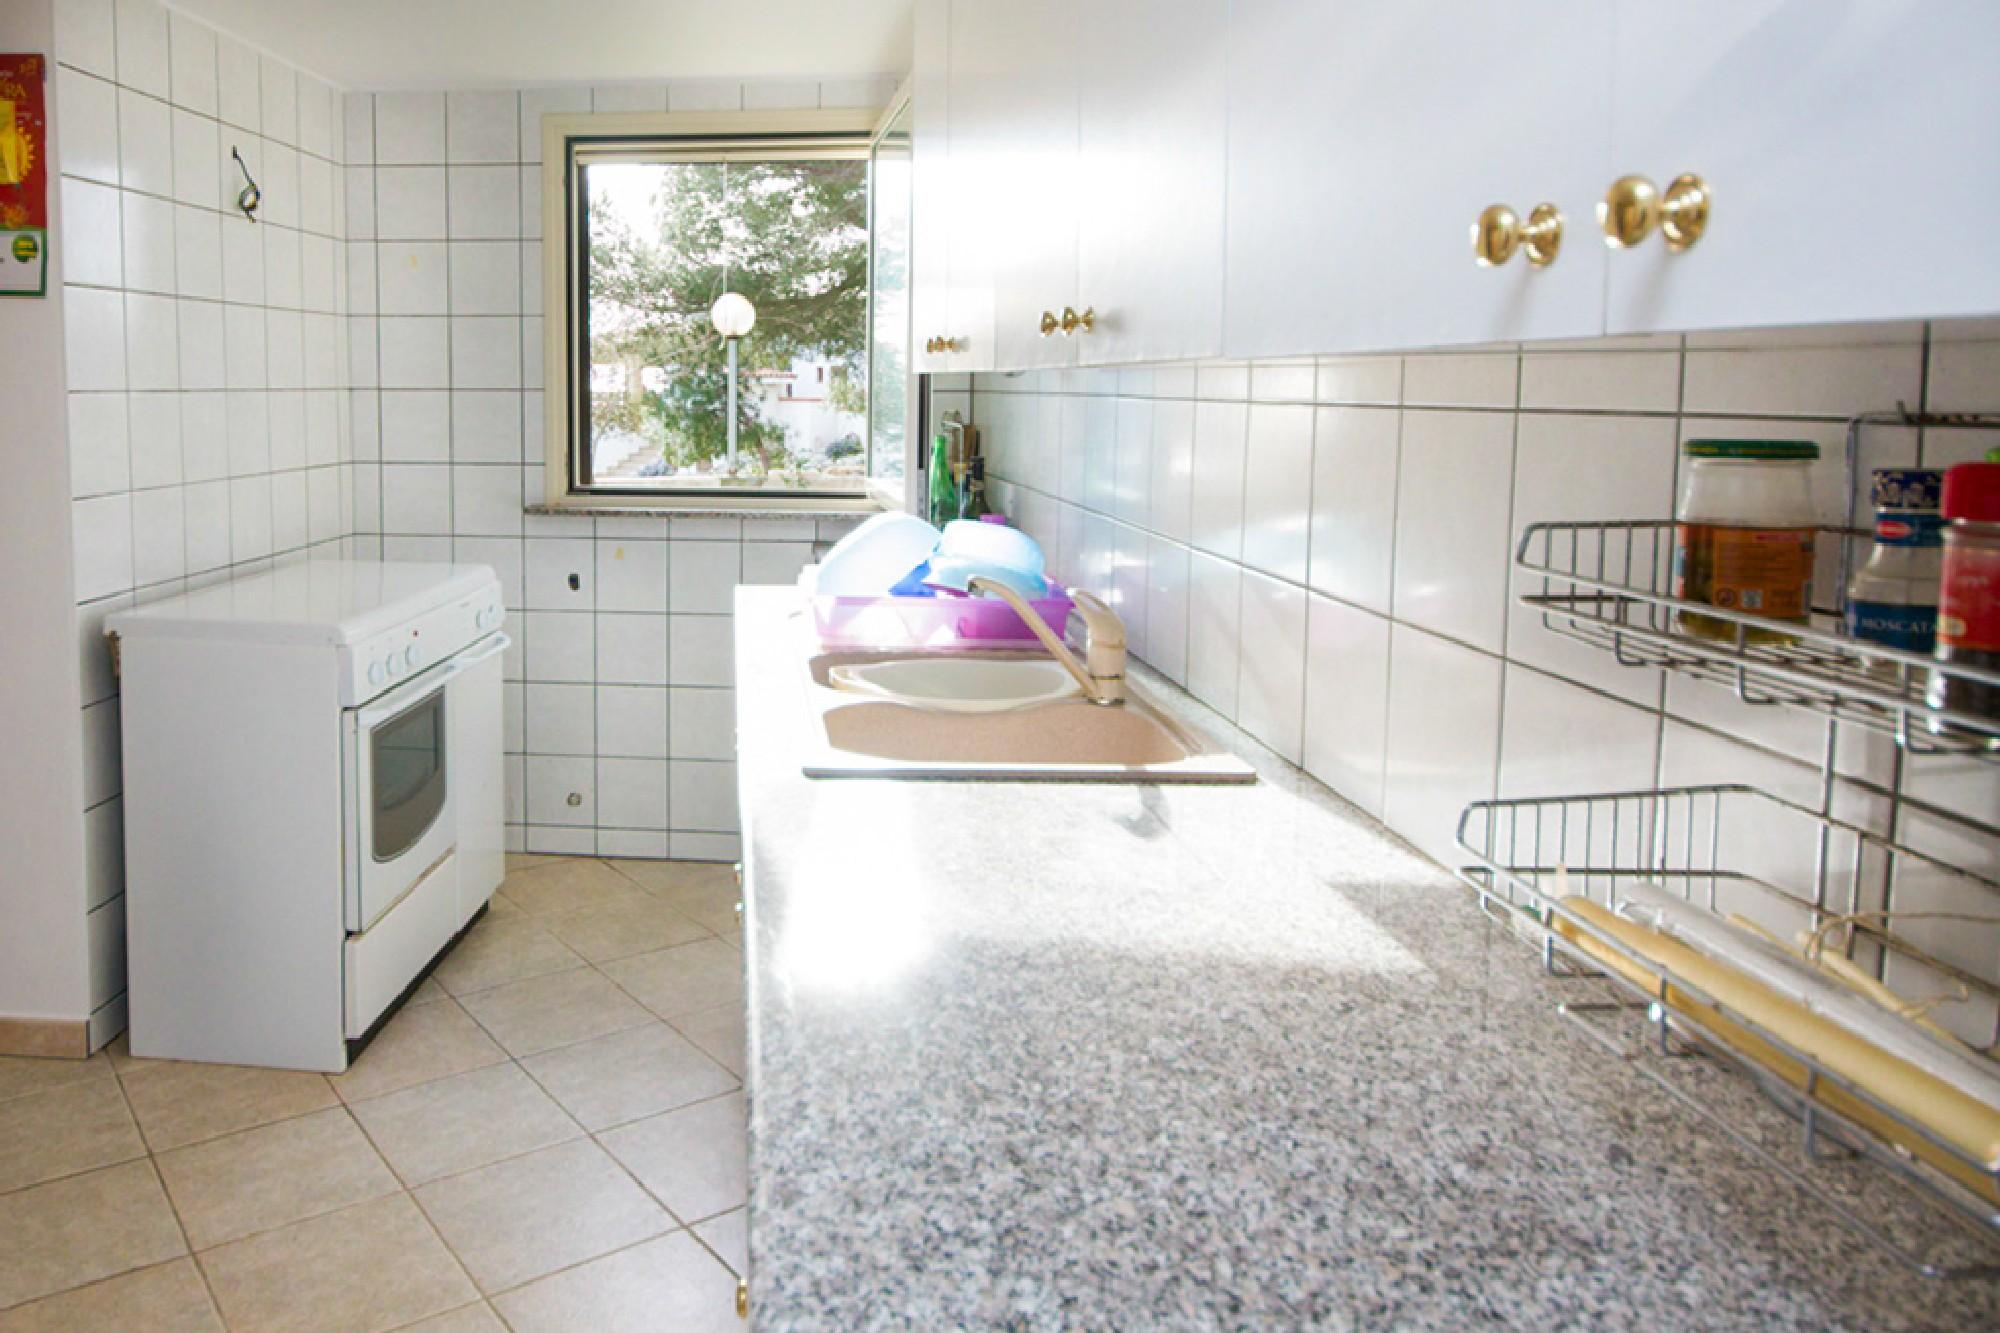 Apartment Apt Porticato 2 - Cantoru photo 24289669